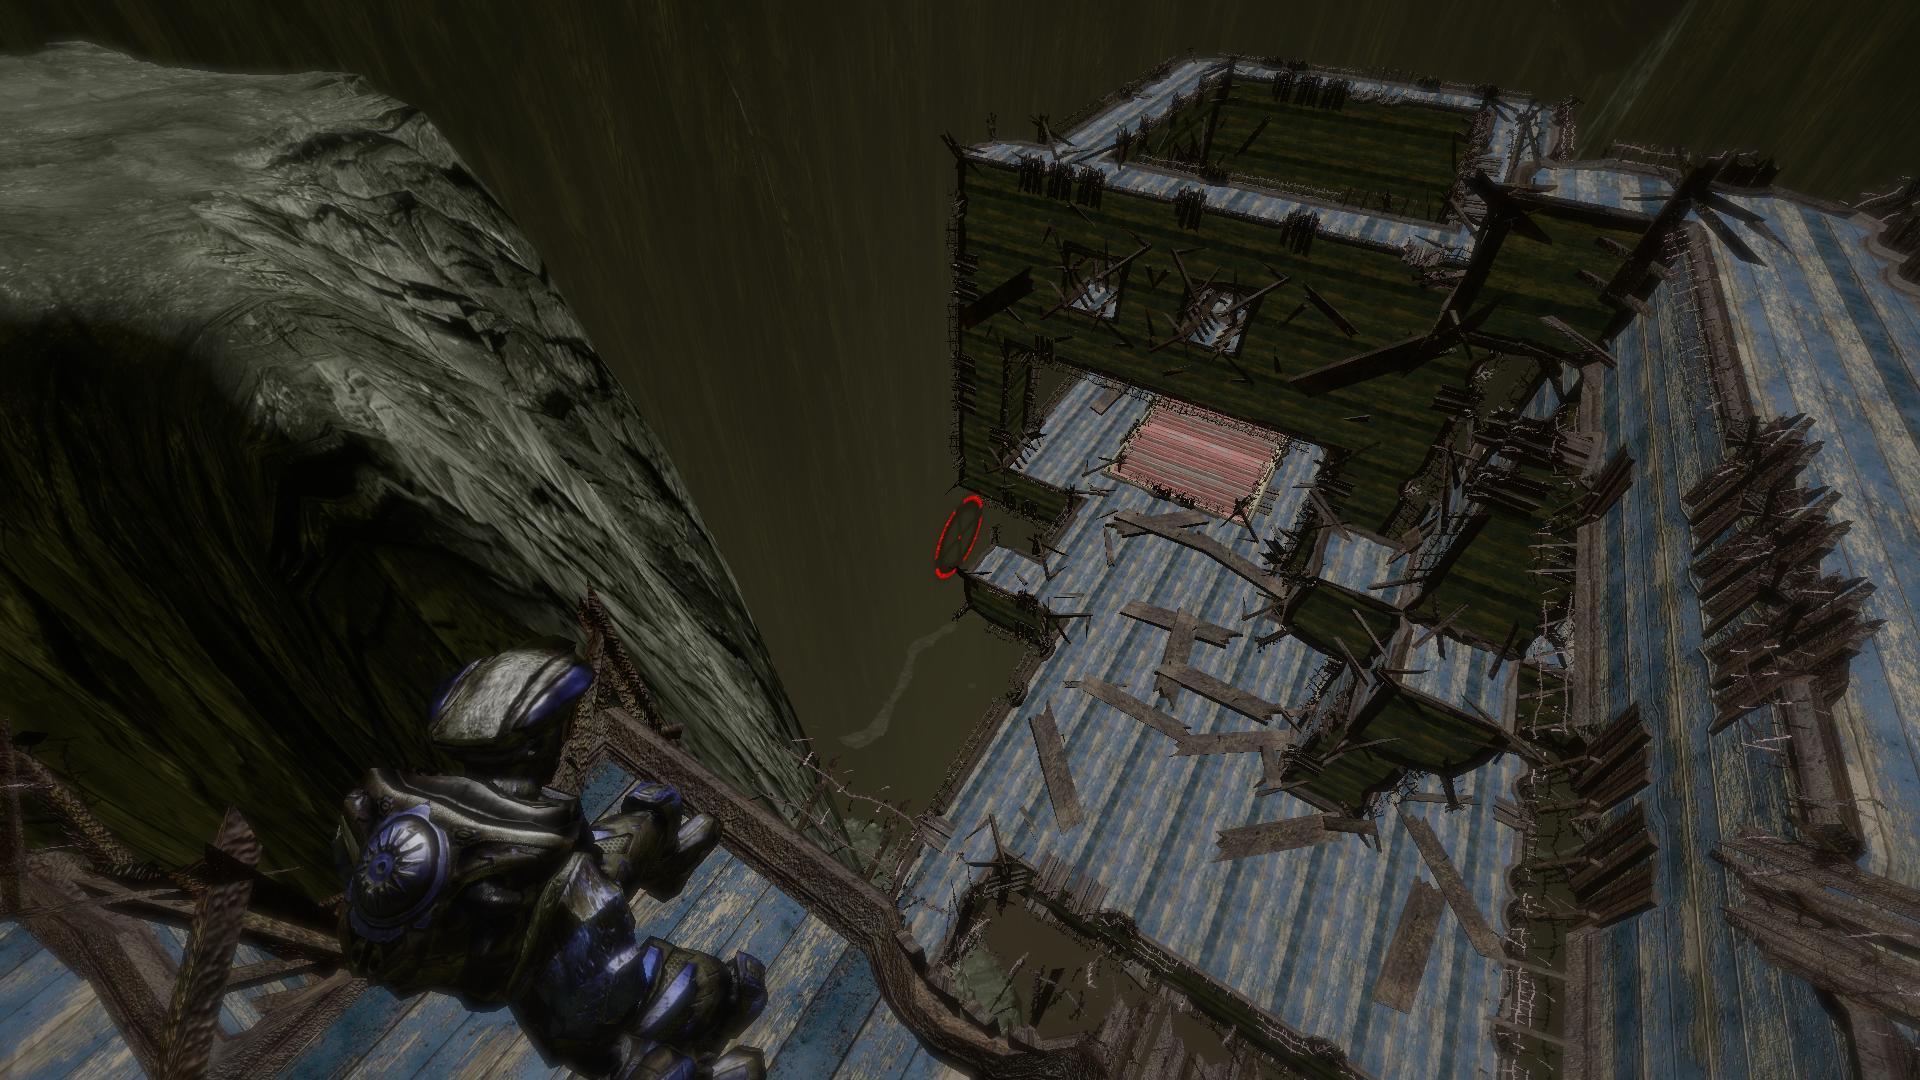 Image - Star Forge destroyed.jpg | Wookieepedia | FANDOM powered ...